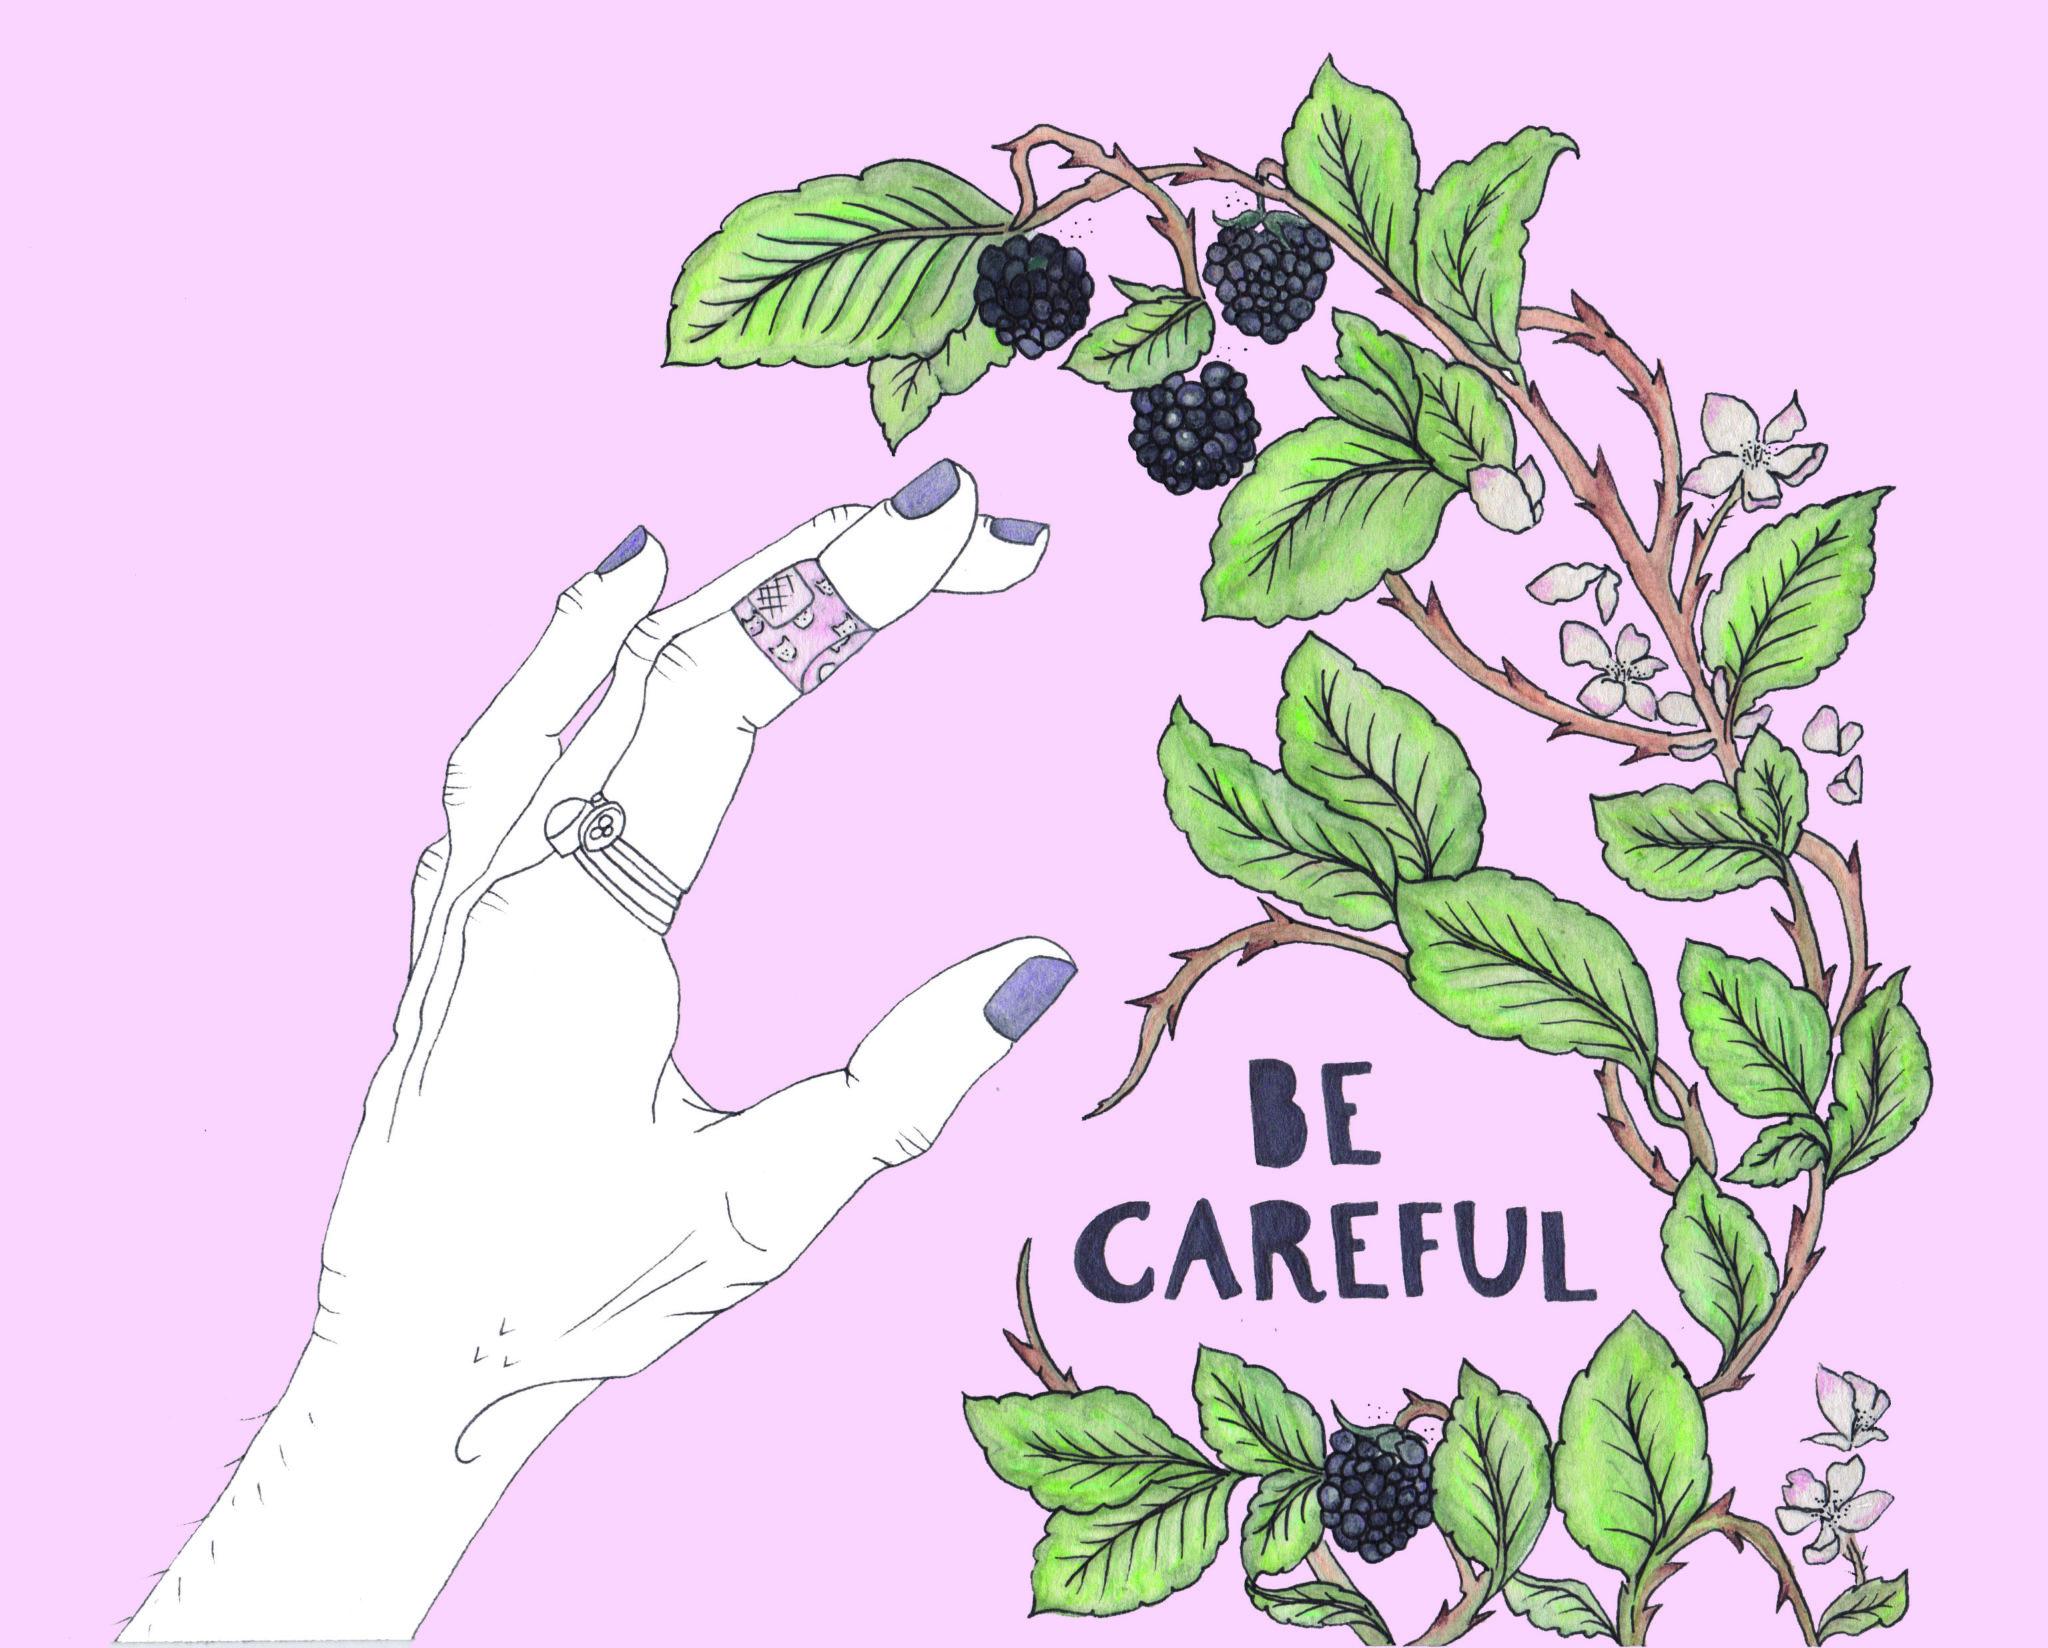 Haley Brown - Be Careful